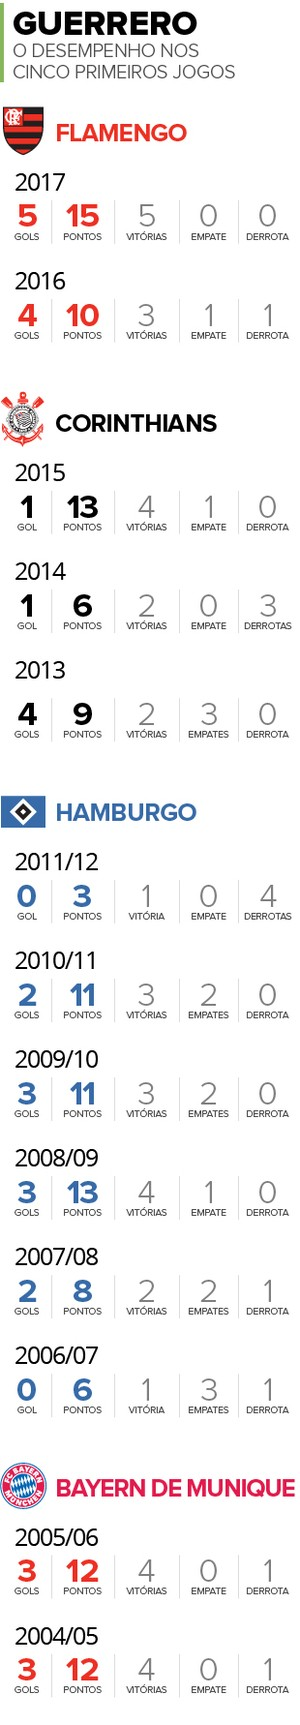 Info-GUERRERO-inicio-de-temporada (Foto: infoesporte)